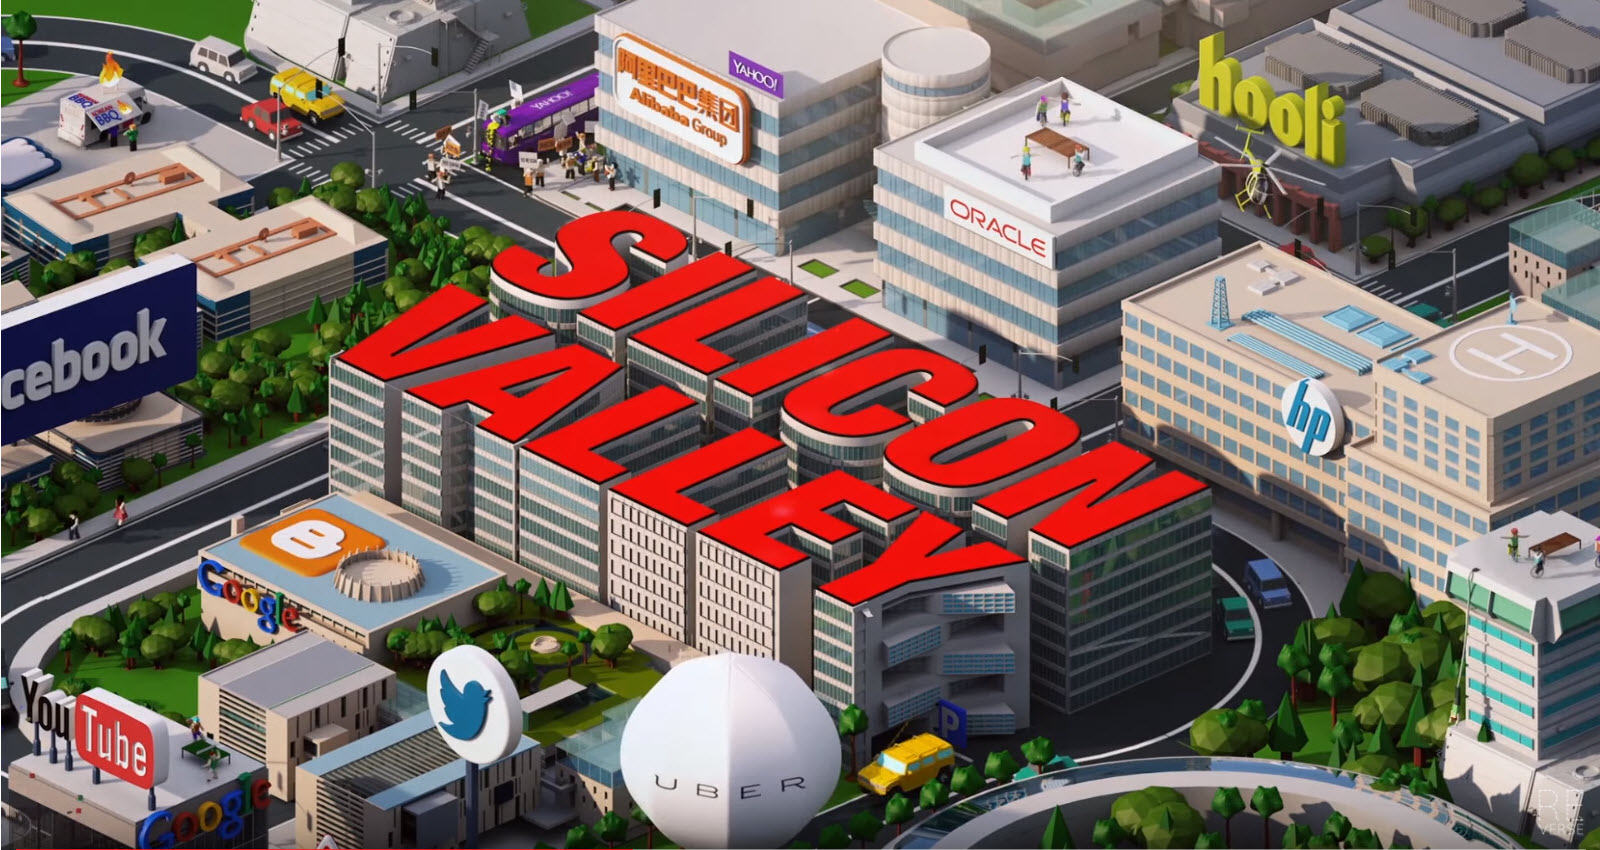 Season 2 - New startups: 23 & Me, Alibaba, Anybots, Appcelerator, Chrome, Occulus, Re/Code, Uber, WhatsApp